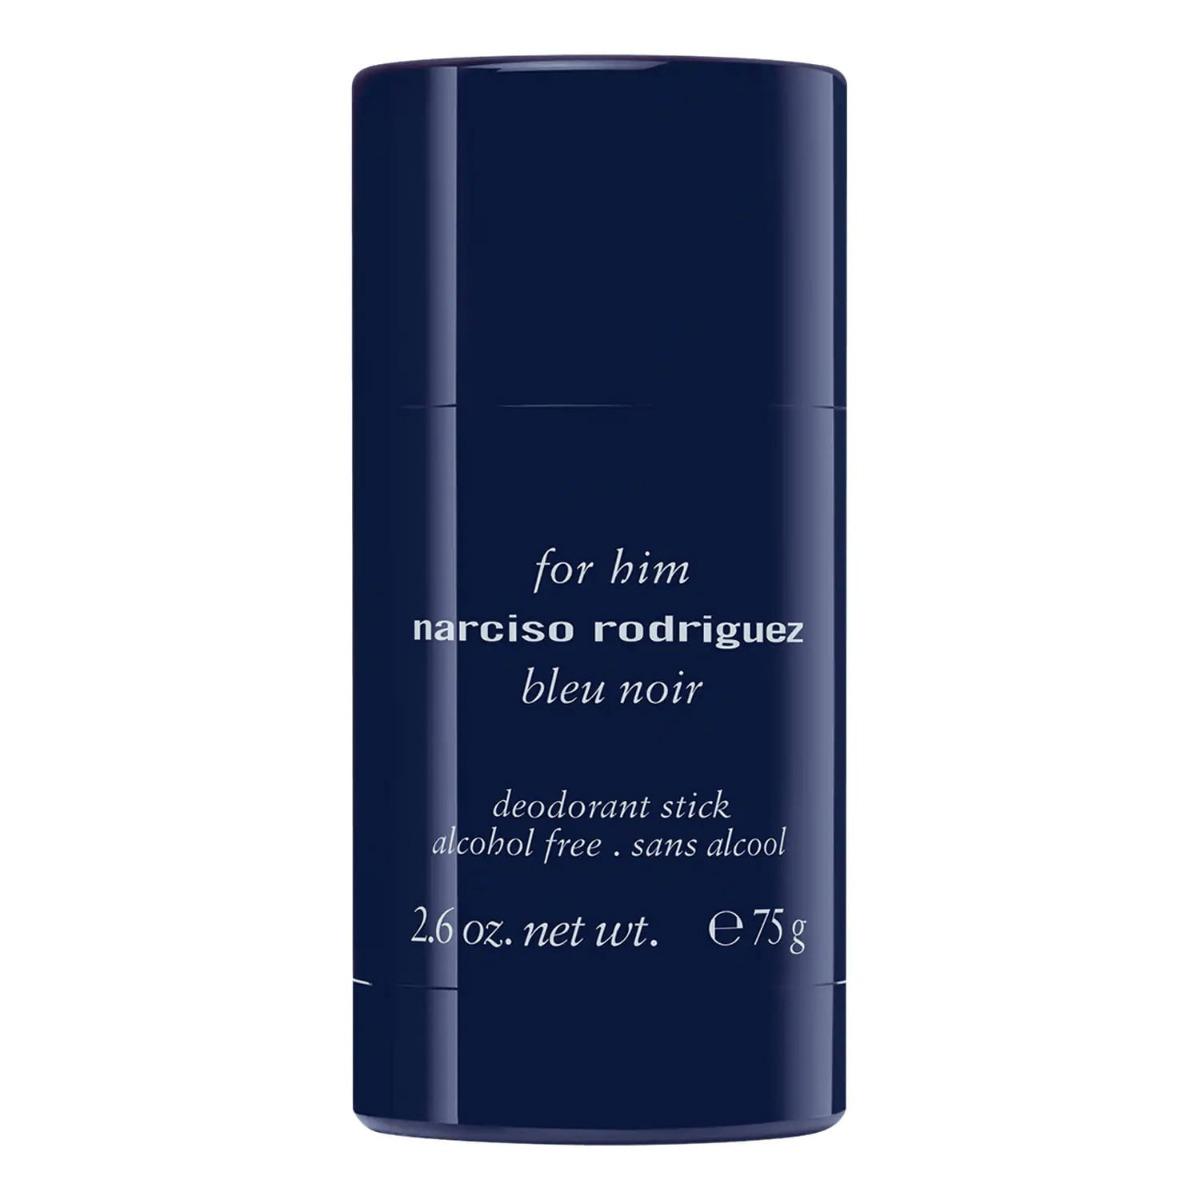 Narciso Rodriguez - for him bleu noir - Déodorant stick 75 g